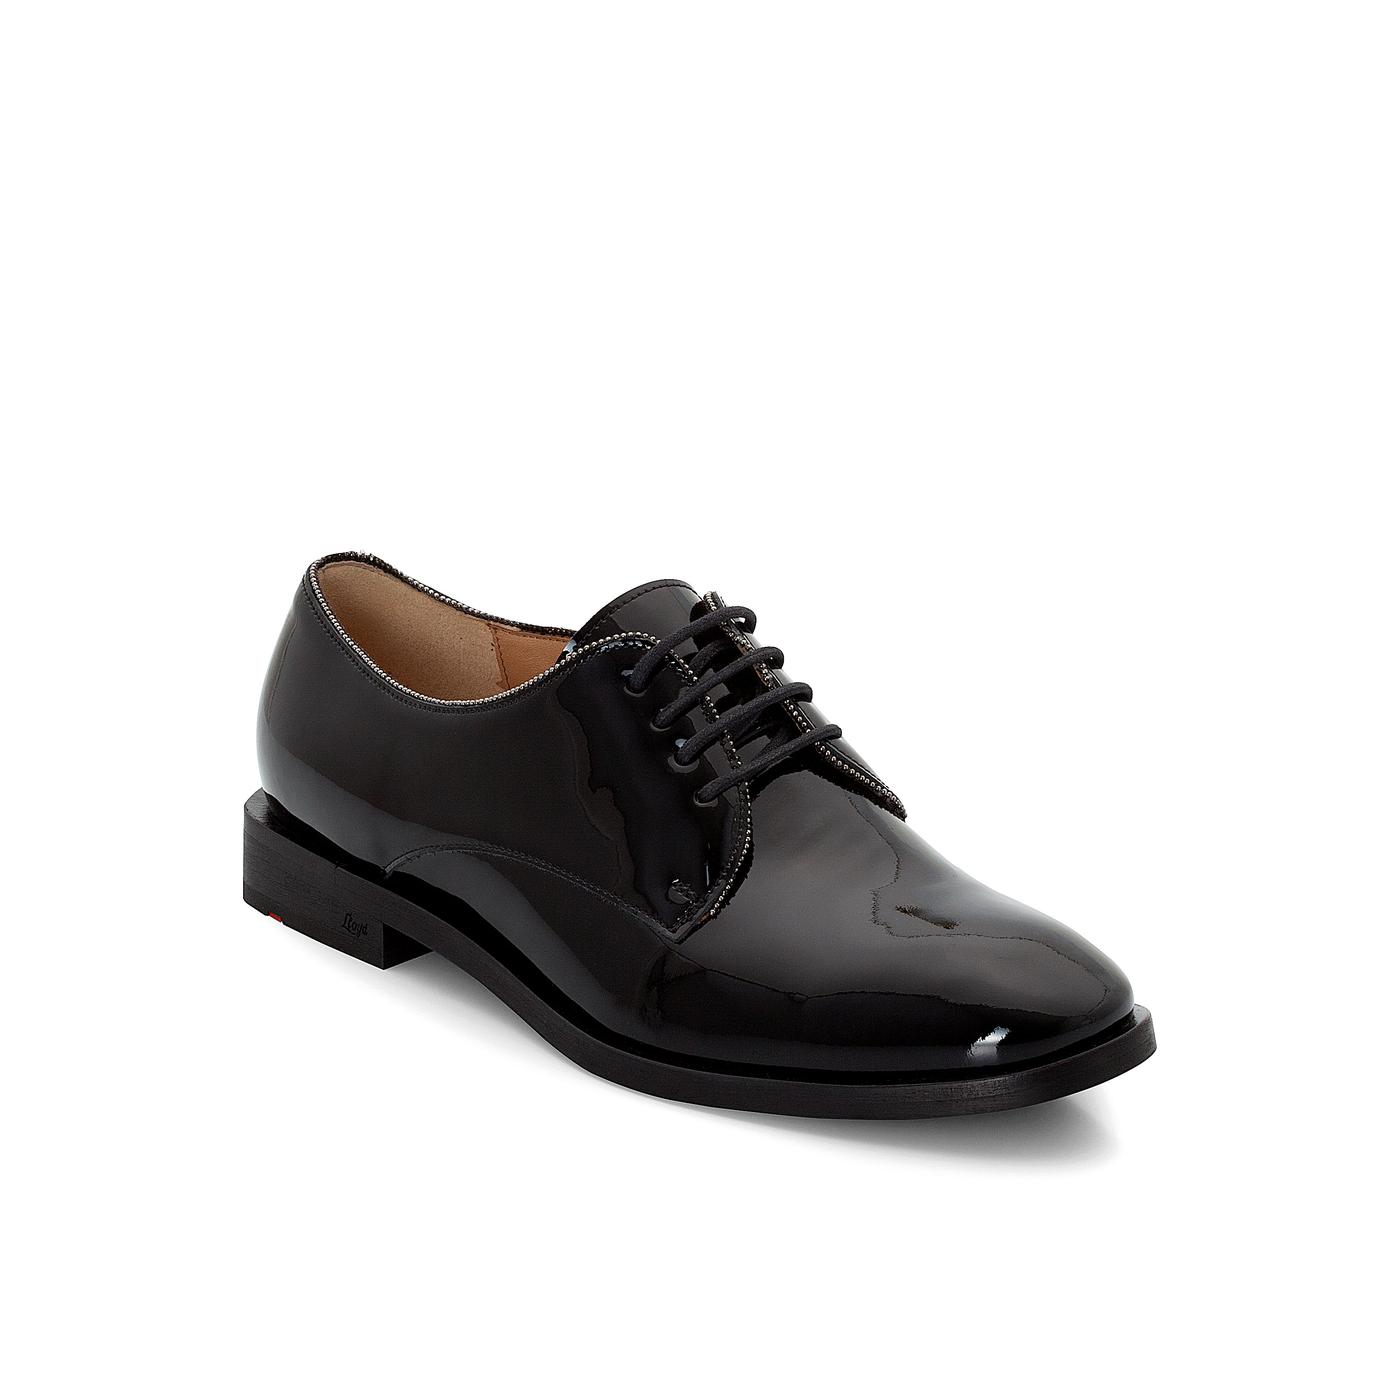 Halbschuhe | Schuhe > Boots > Schnürboots | Schwarz | Glattleder -  leder | LLOYD